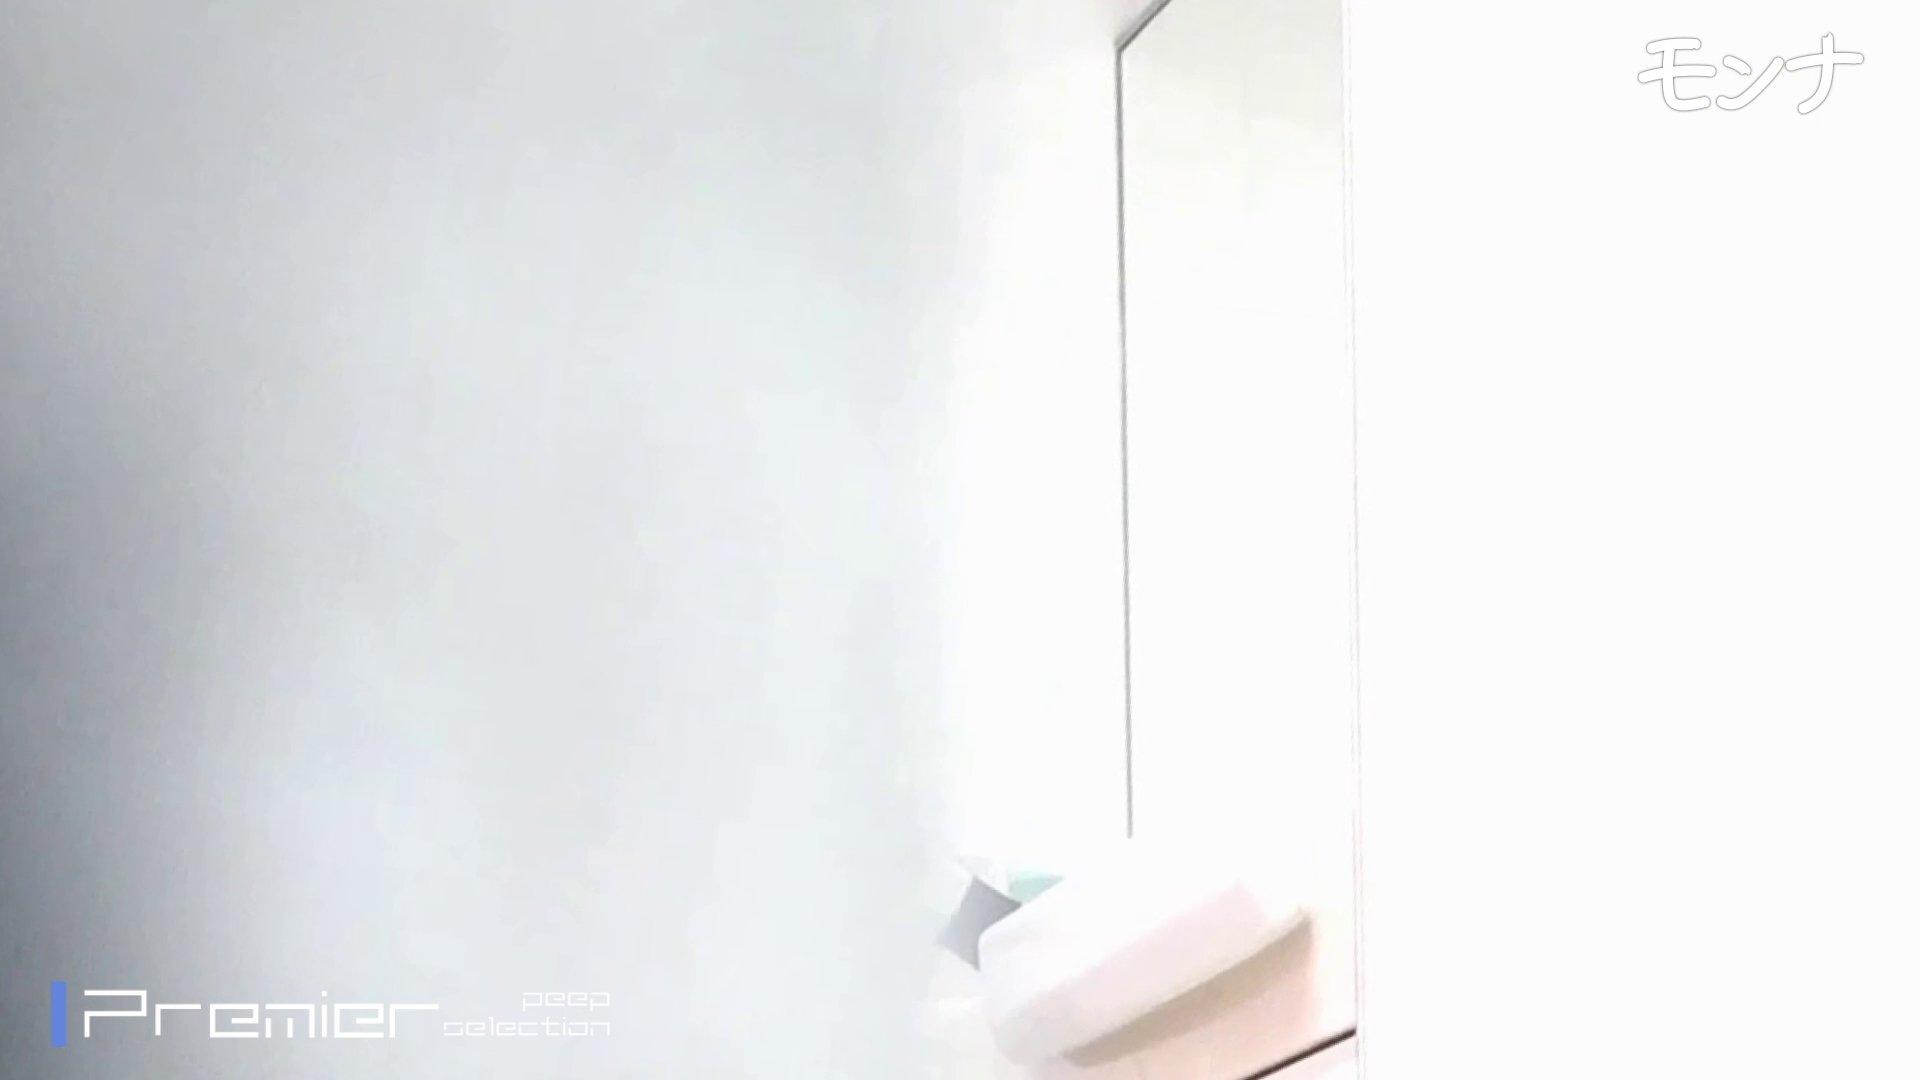 CM 悶絶シリーズ5 【美しい日本の未来 No.128】 洗面所のぞき オメコ動画キャプチャ 111枚 57